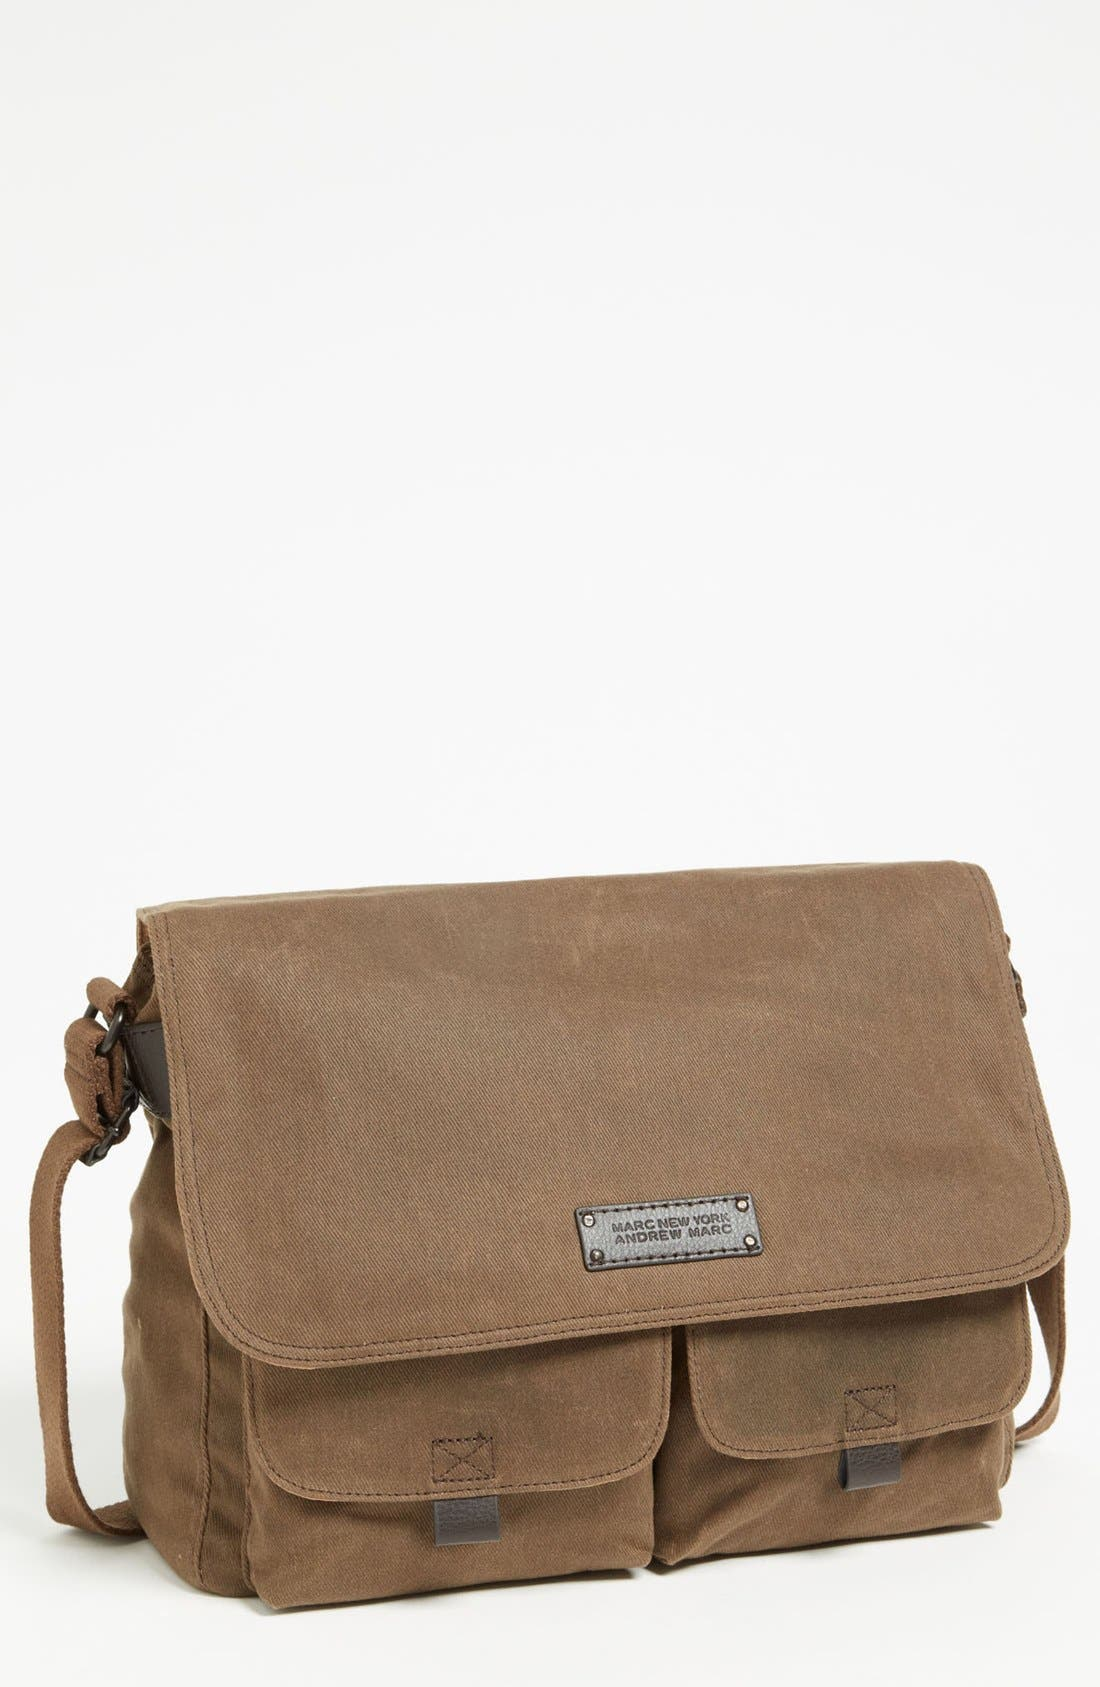 Alternate Image 1 Selected - Andrew Marc 'Essex' Twill Messenger Bag